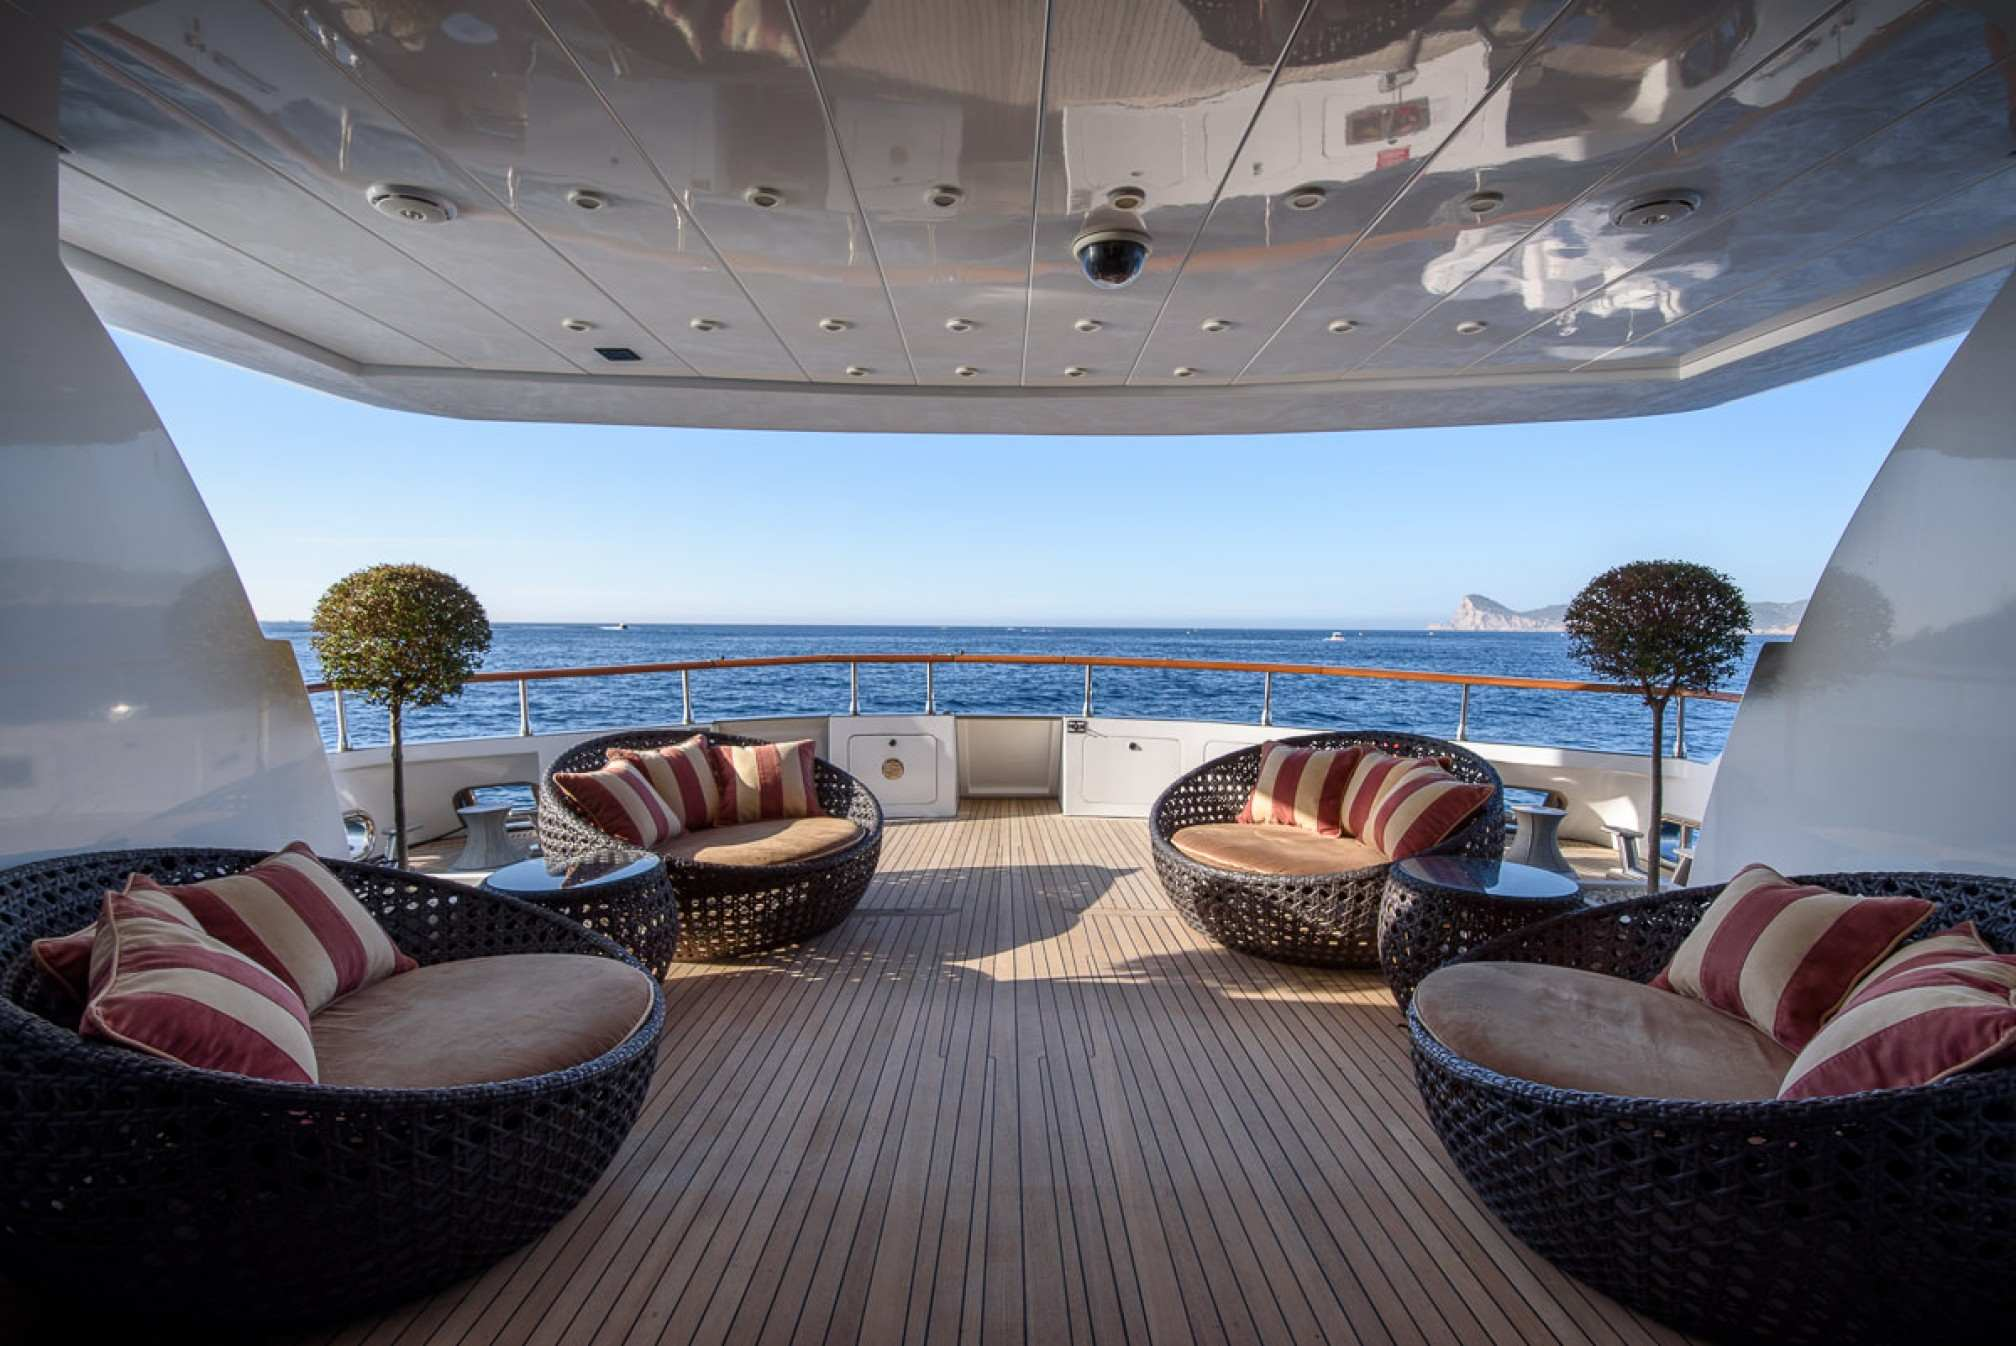 Rental yacht OCEAN GLASS aft salon